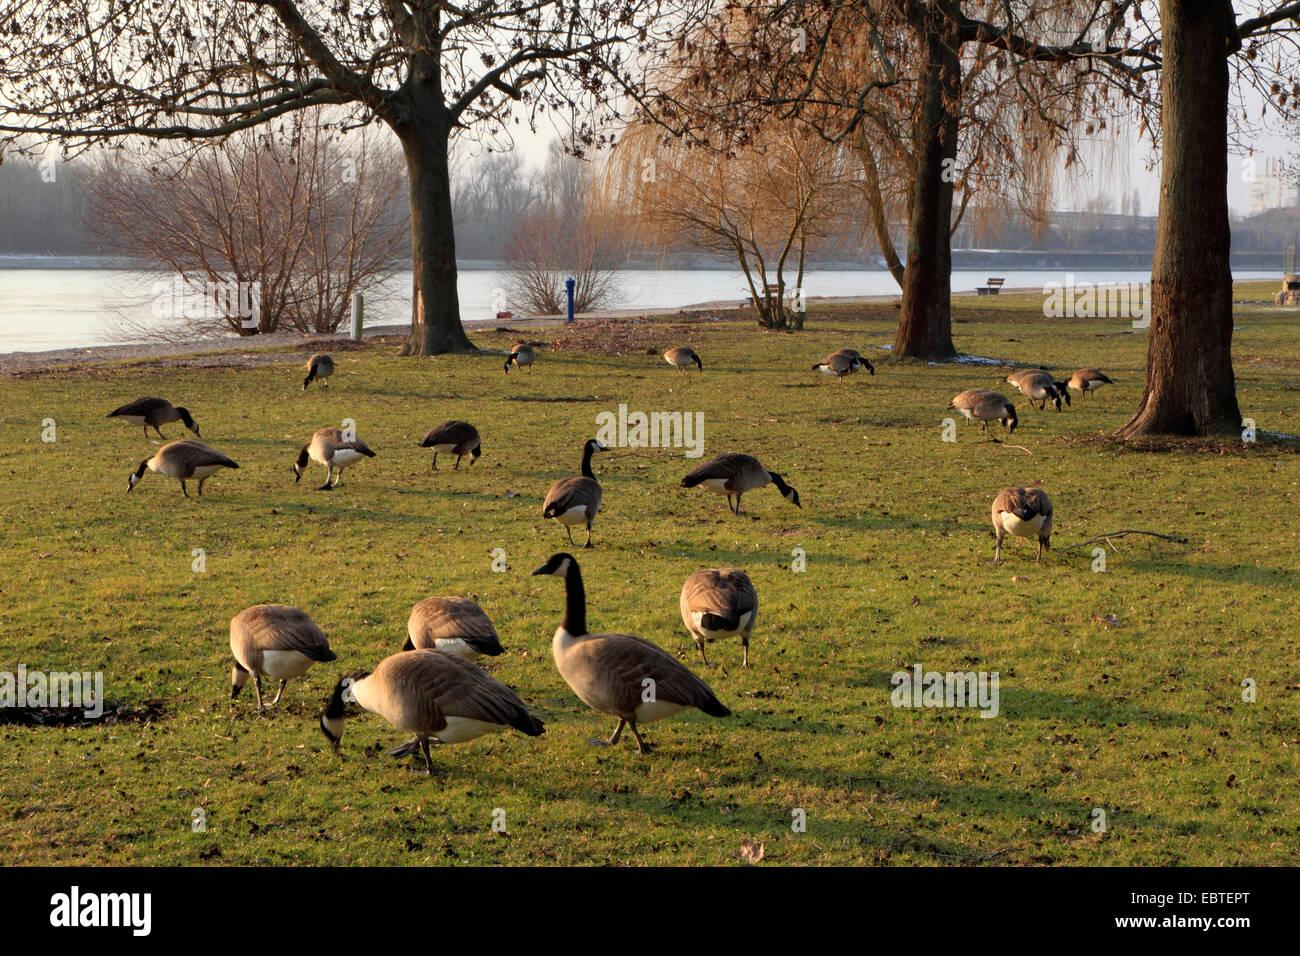 Kanadagans (Branta Canadensis), mehrere Vögel am Rheinufer, Deutschland Stockbild